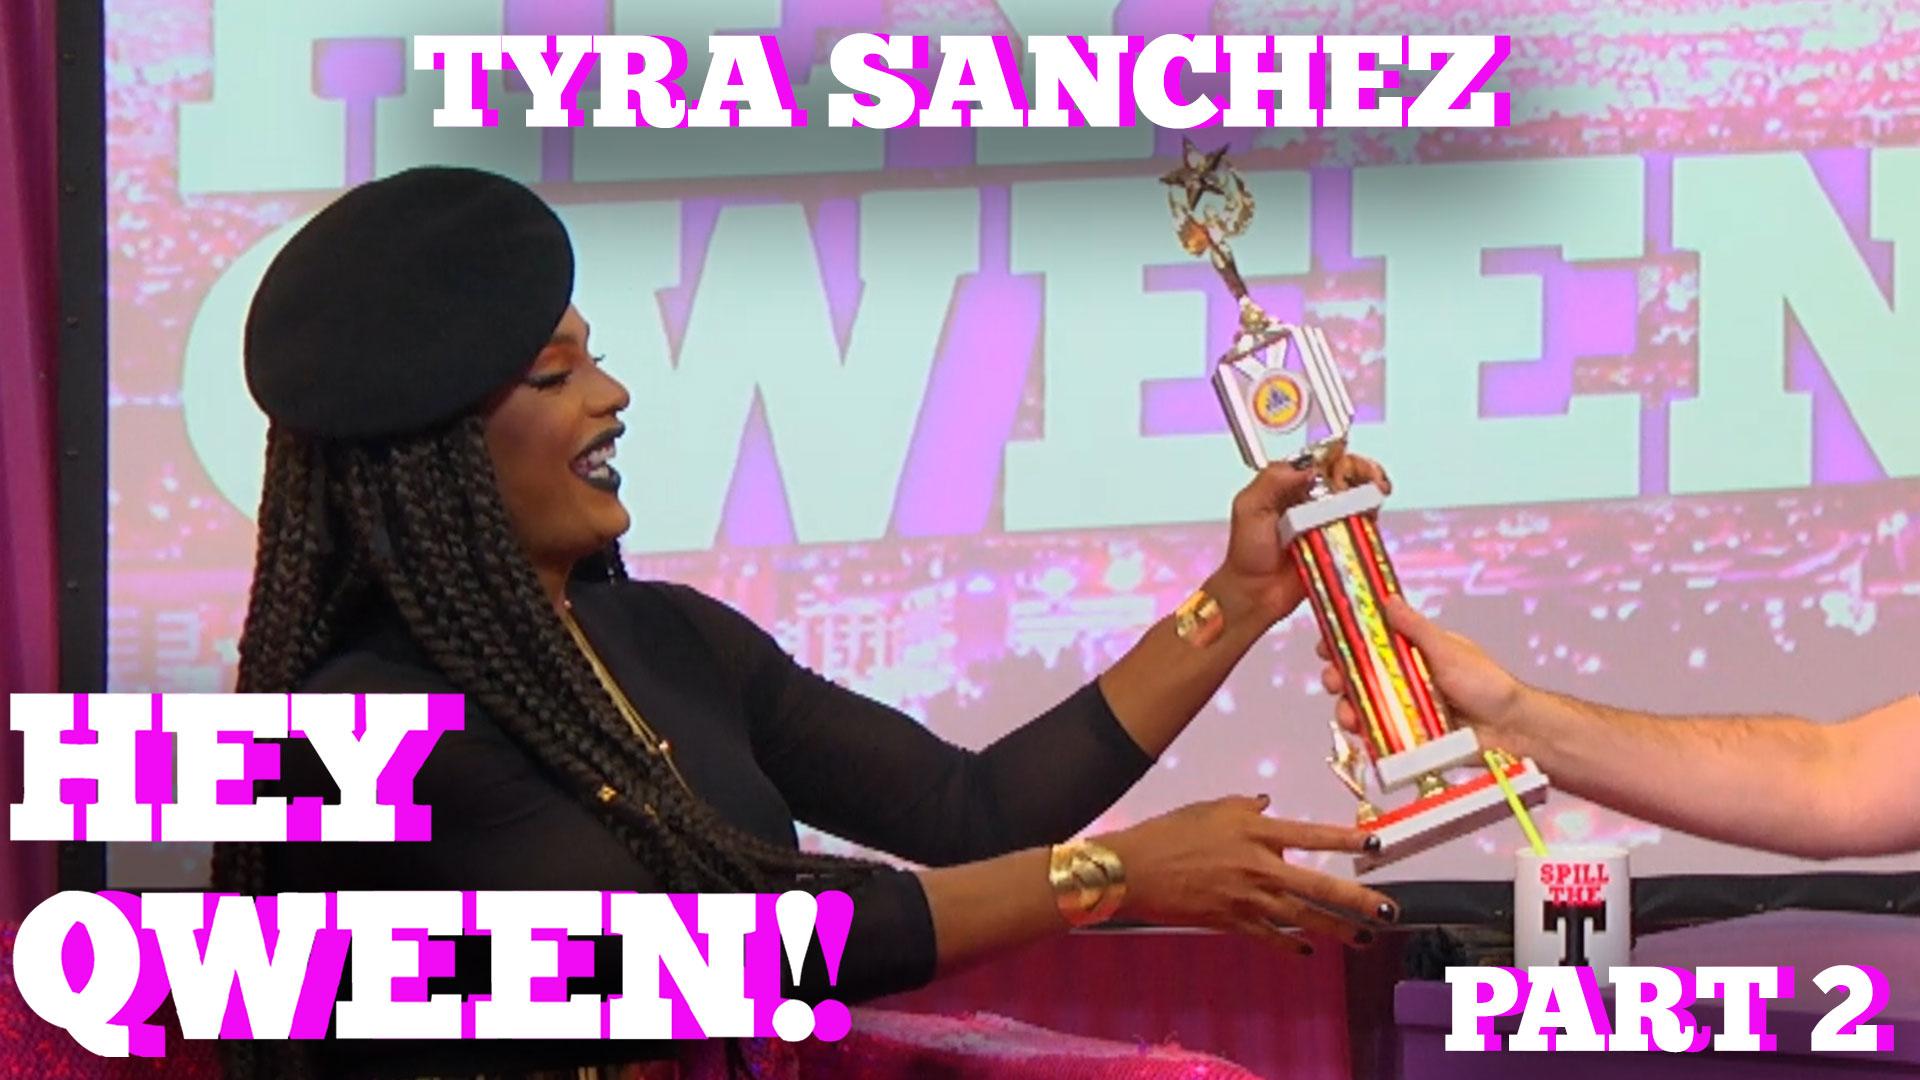 TYRA SANCHEZ Returns To HEY QWEEN Part 2